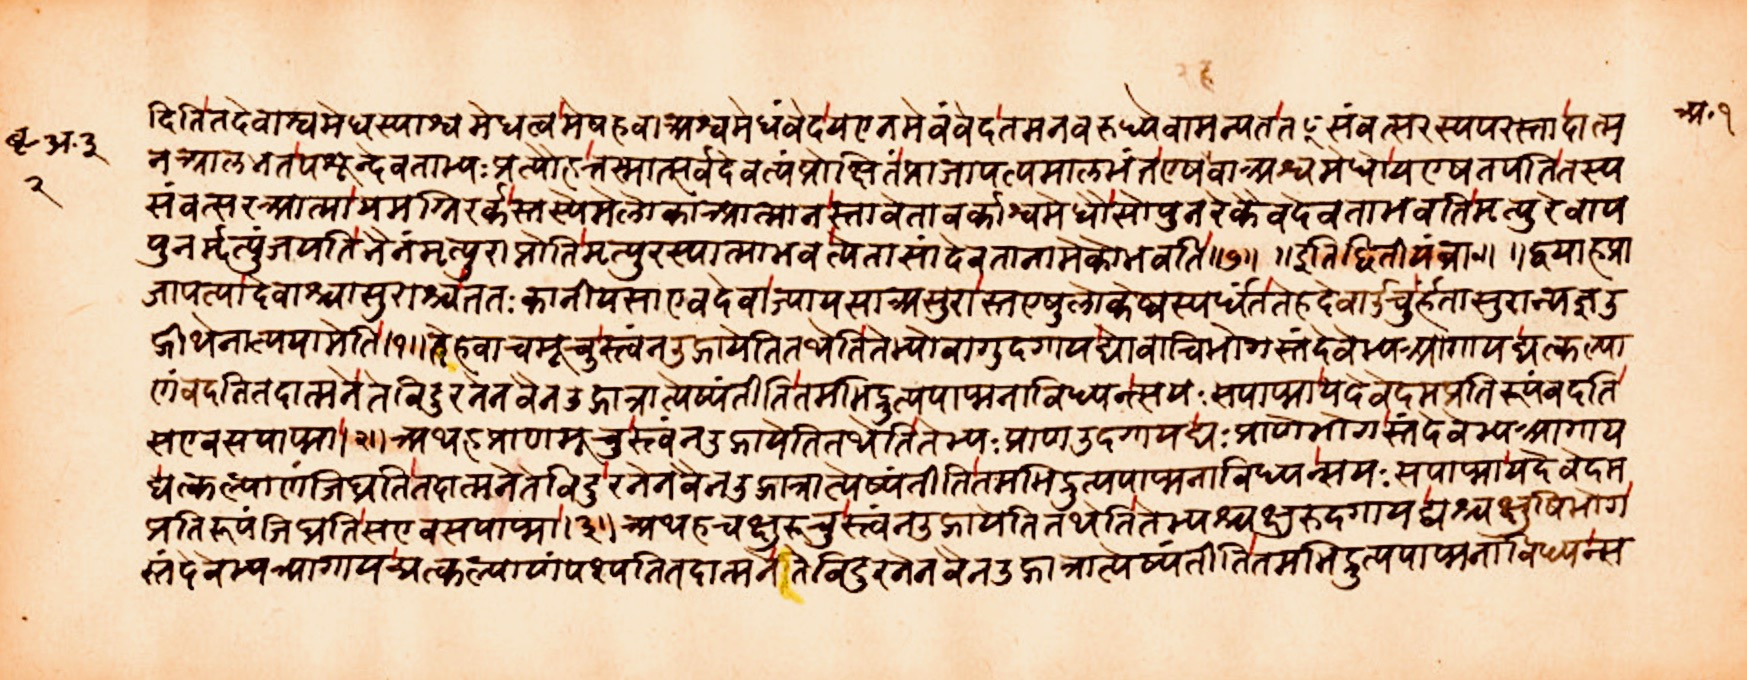 Brihadaranyaka Upanishad | Religion-wiki | FANDOM powered by Wikia